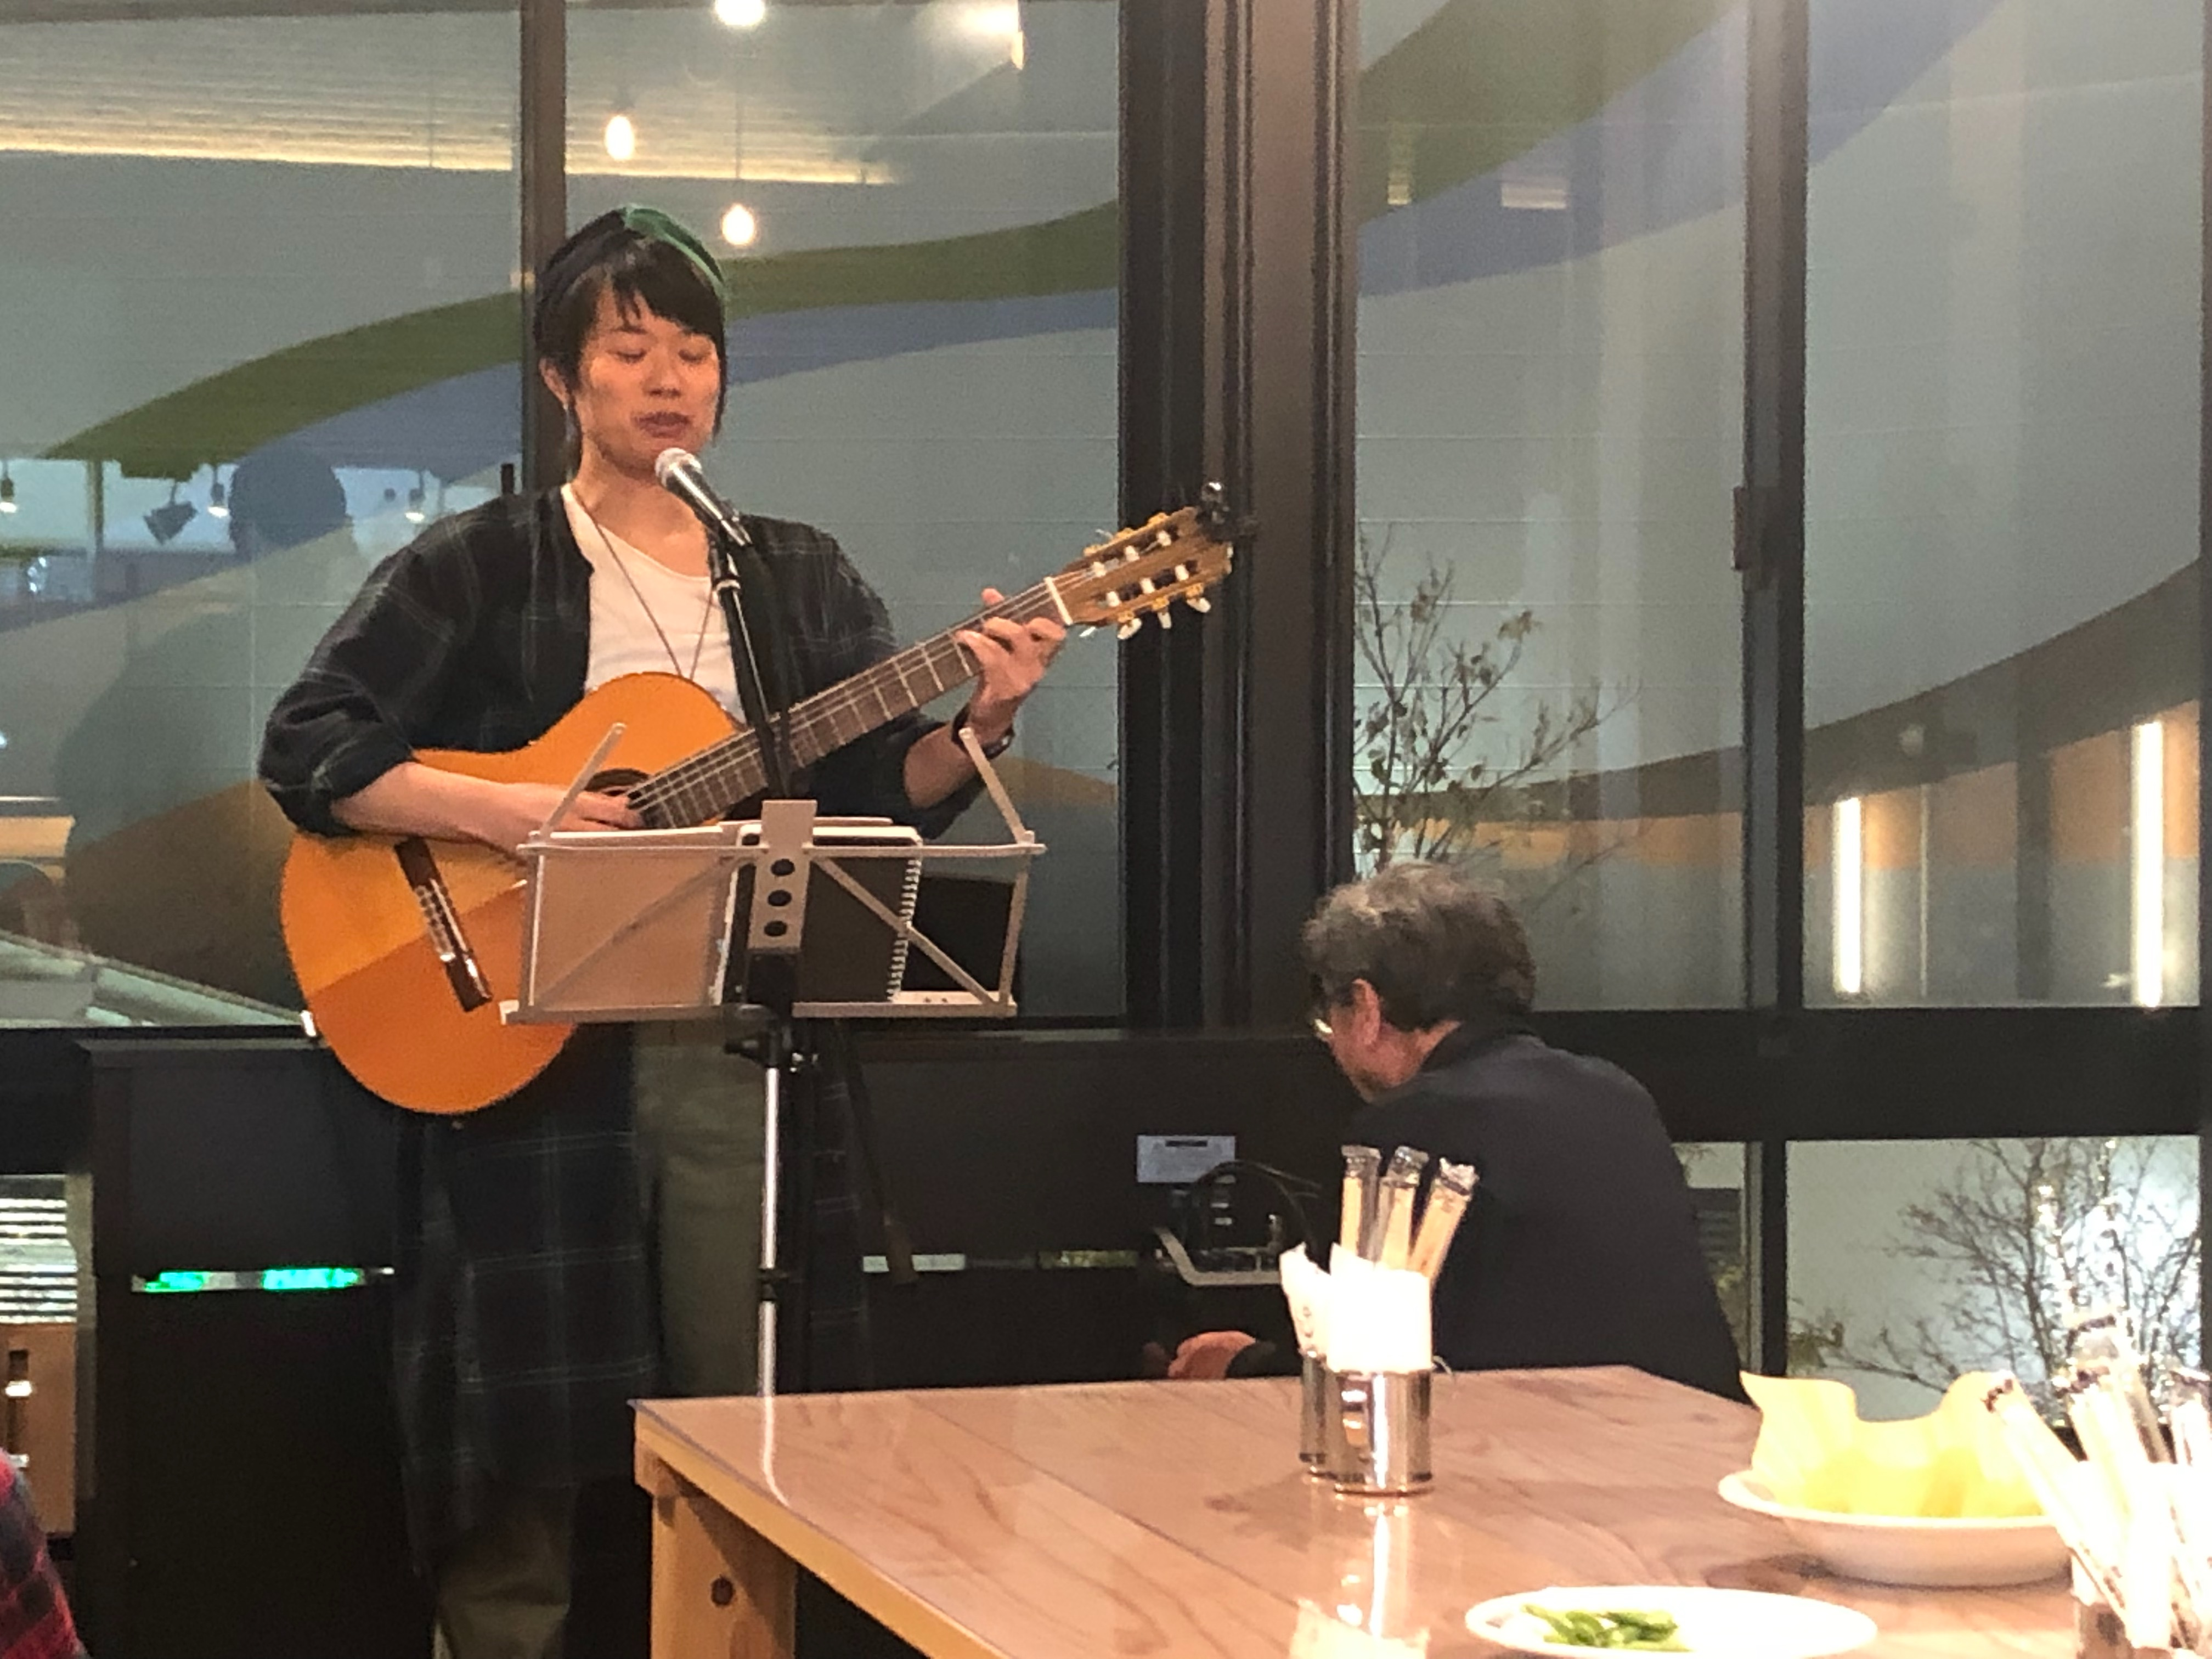 f:id:masanori-kato1972:20190422183939j:image